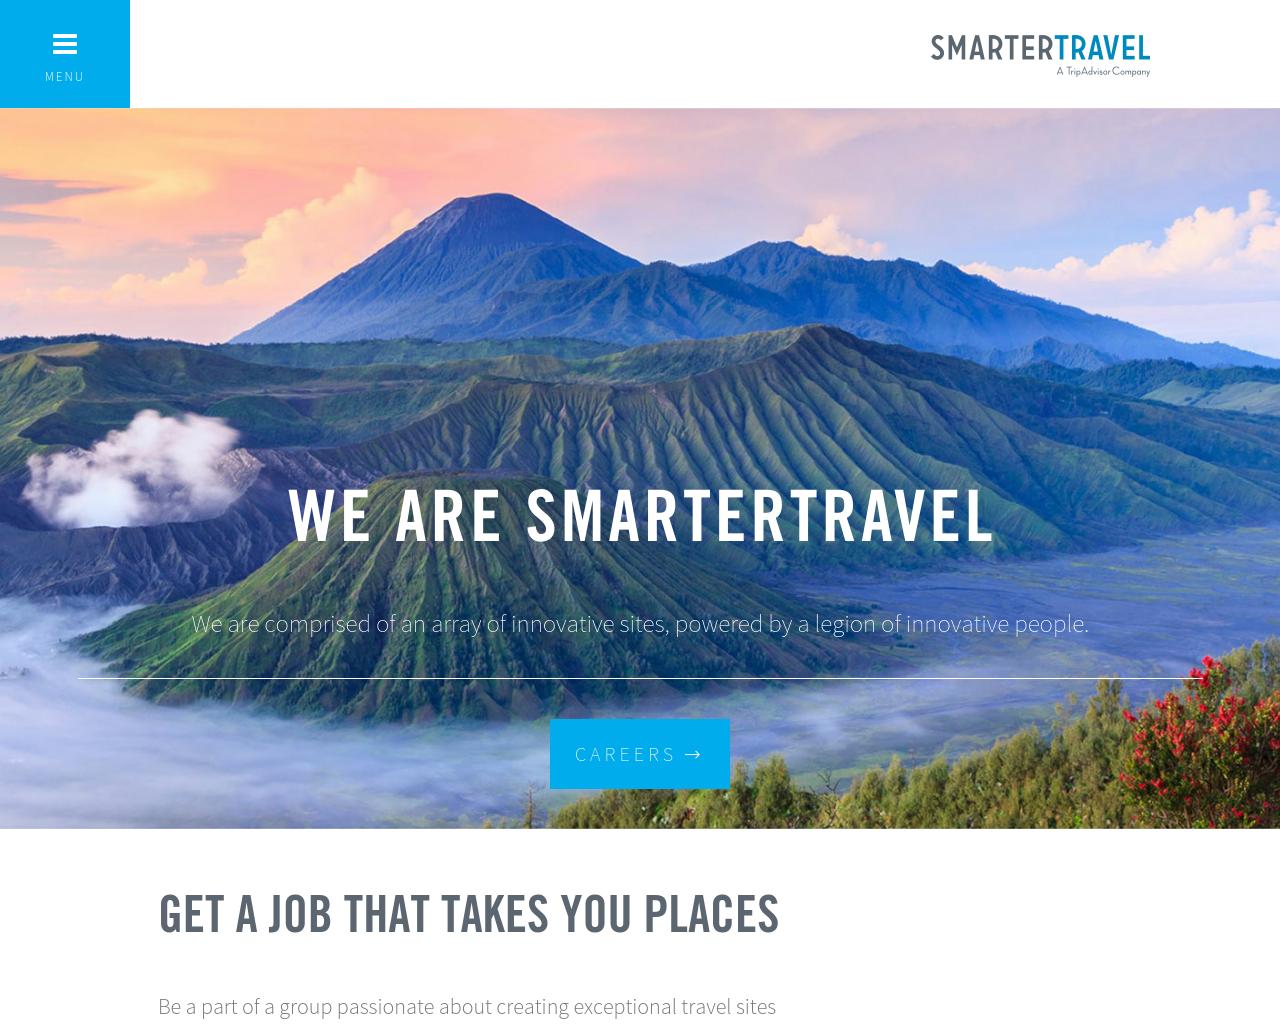 Smarter-Travel-Media-Advertising-Reviews-Pricing